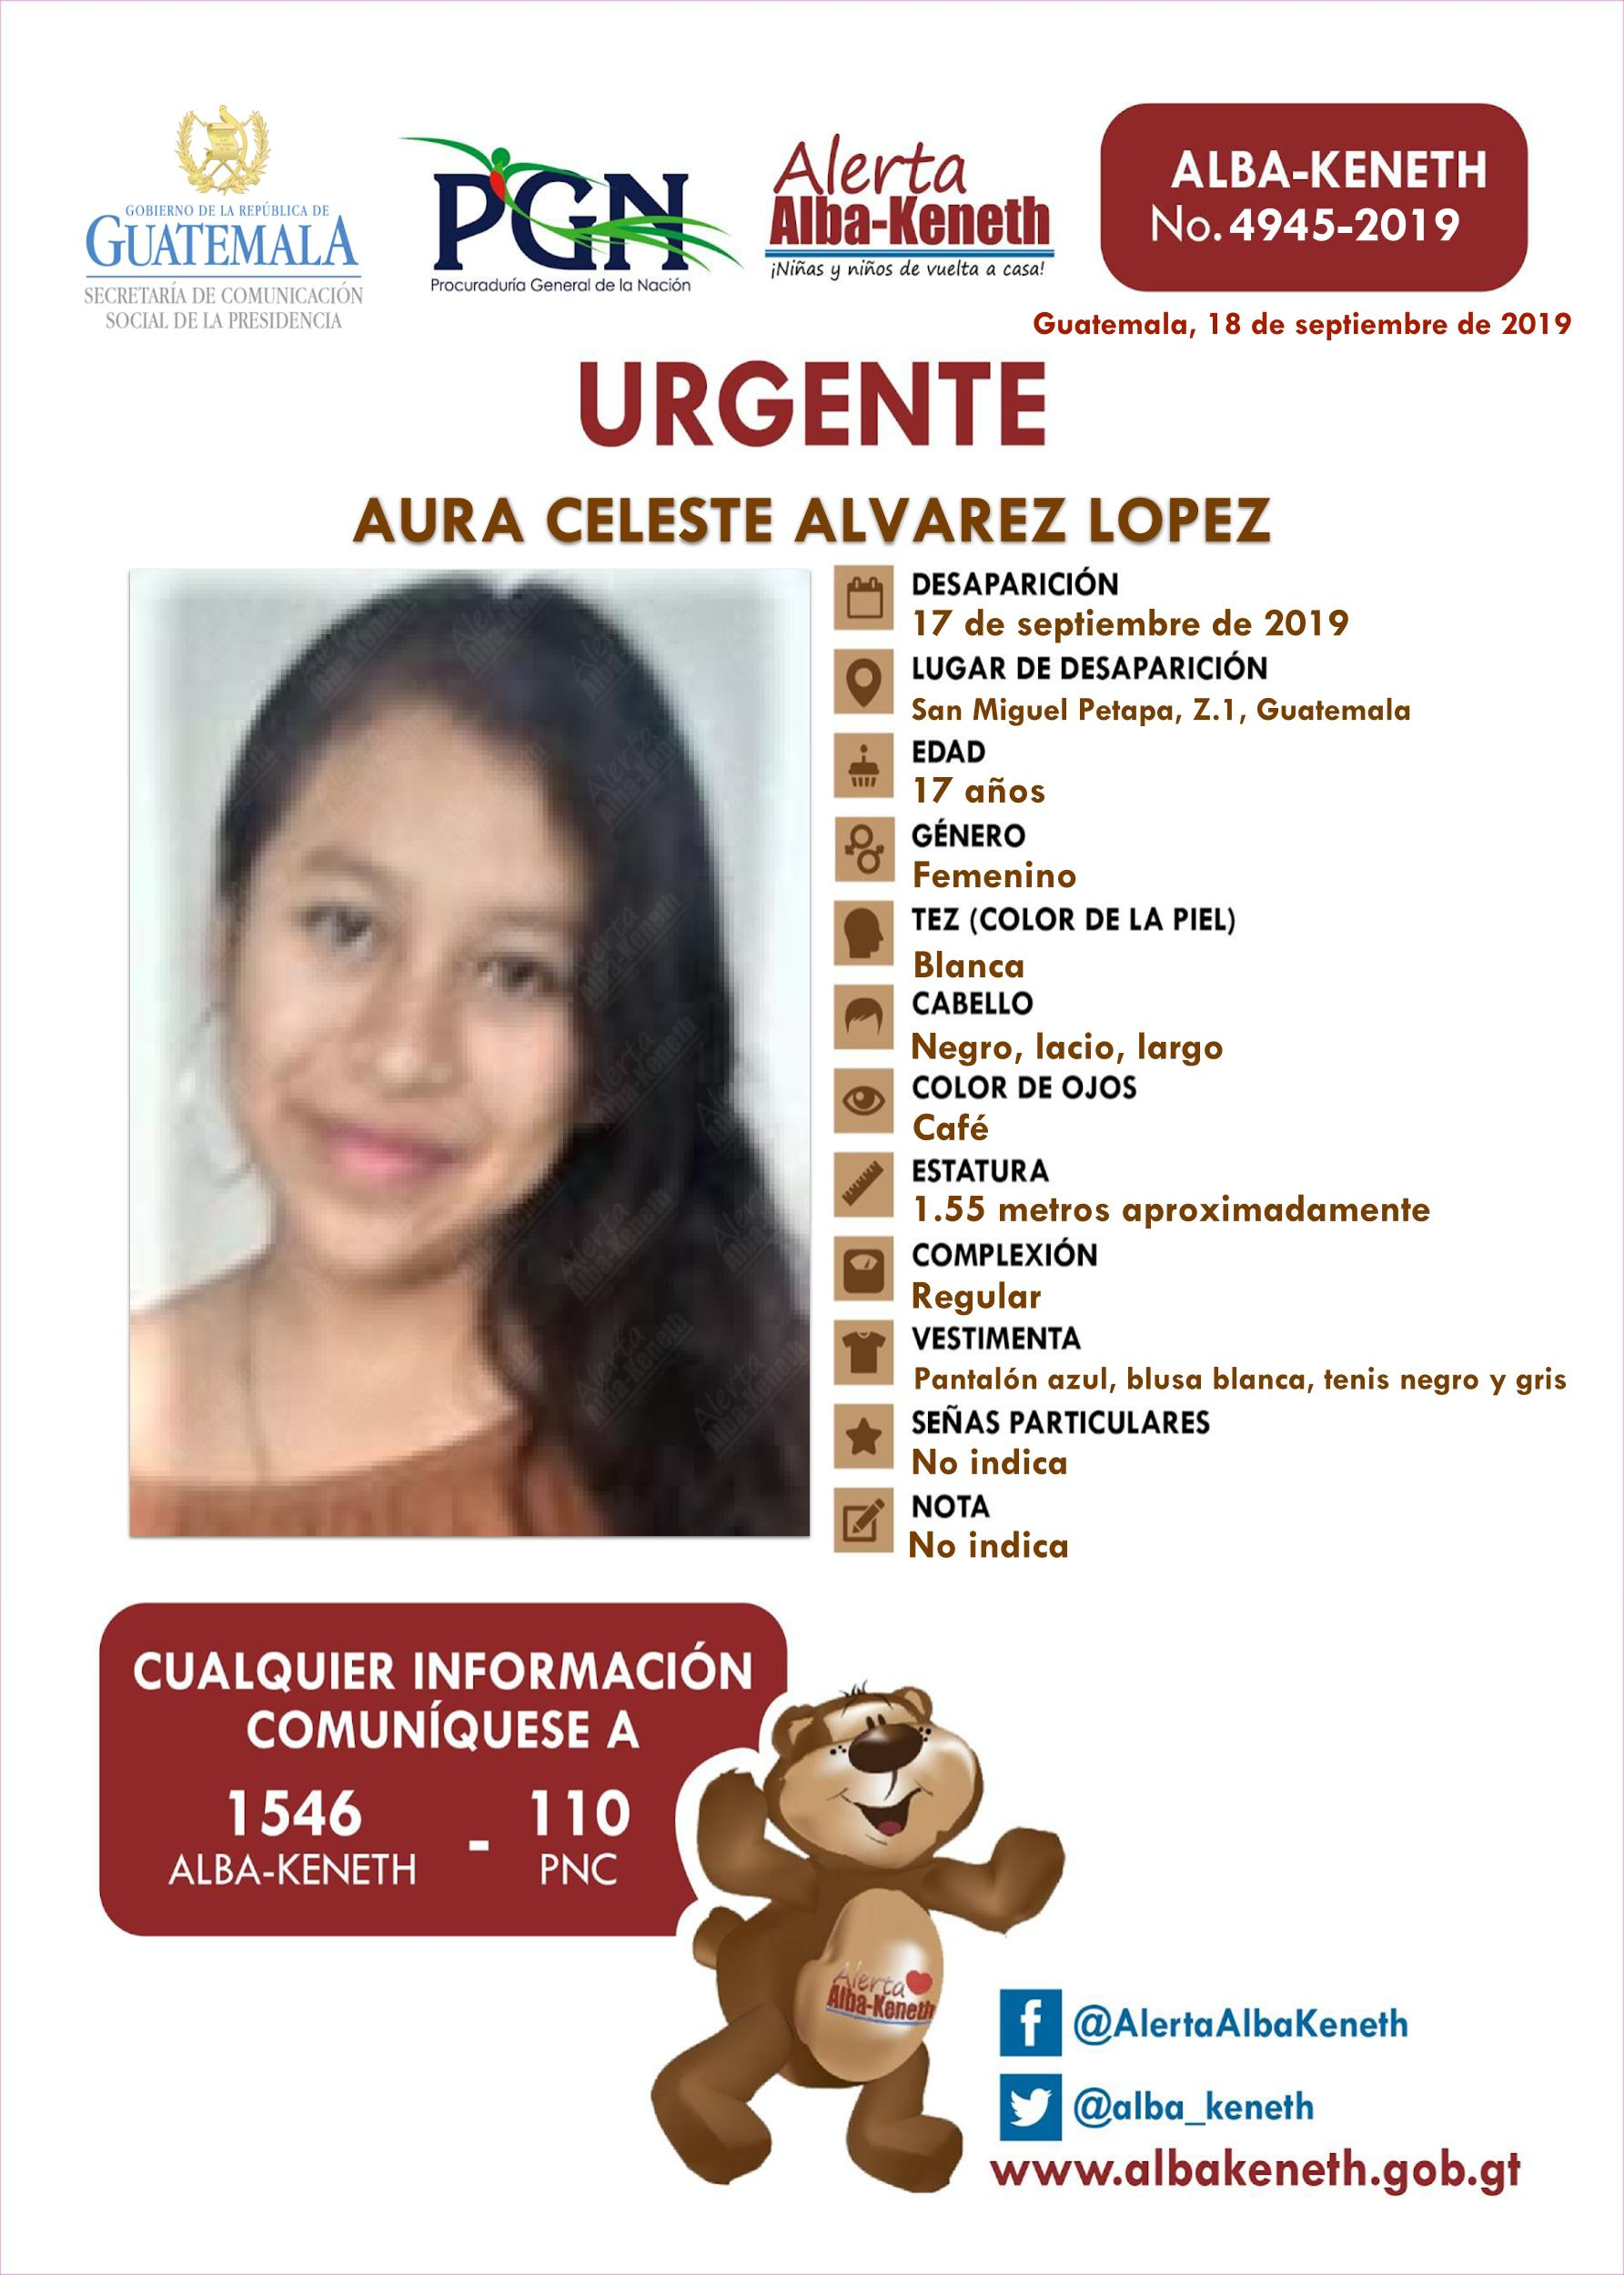 Aura Celeste Alvarez Lopez